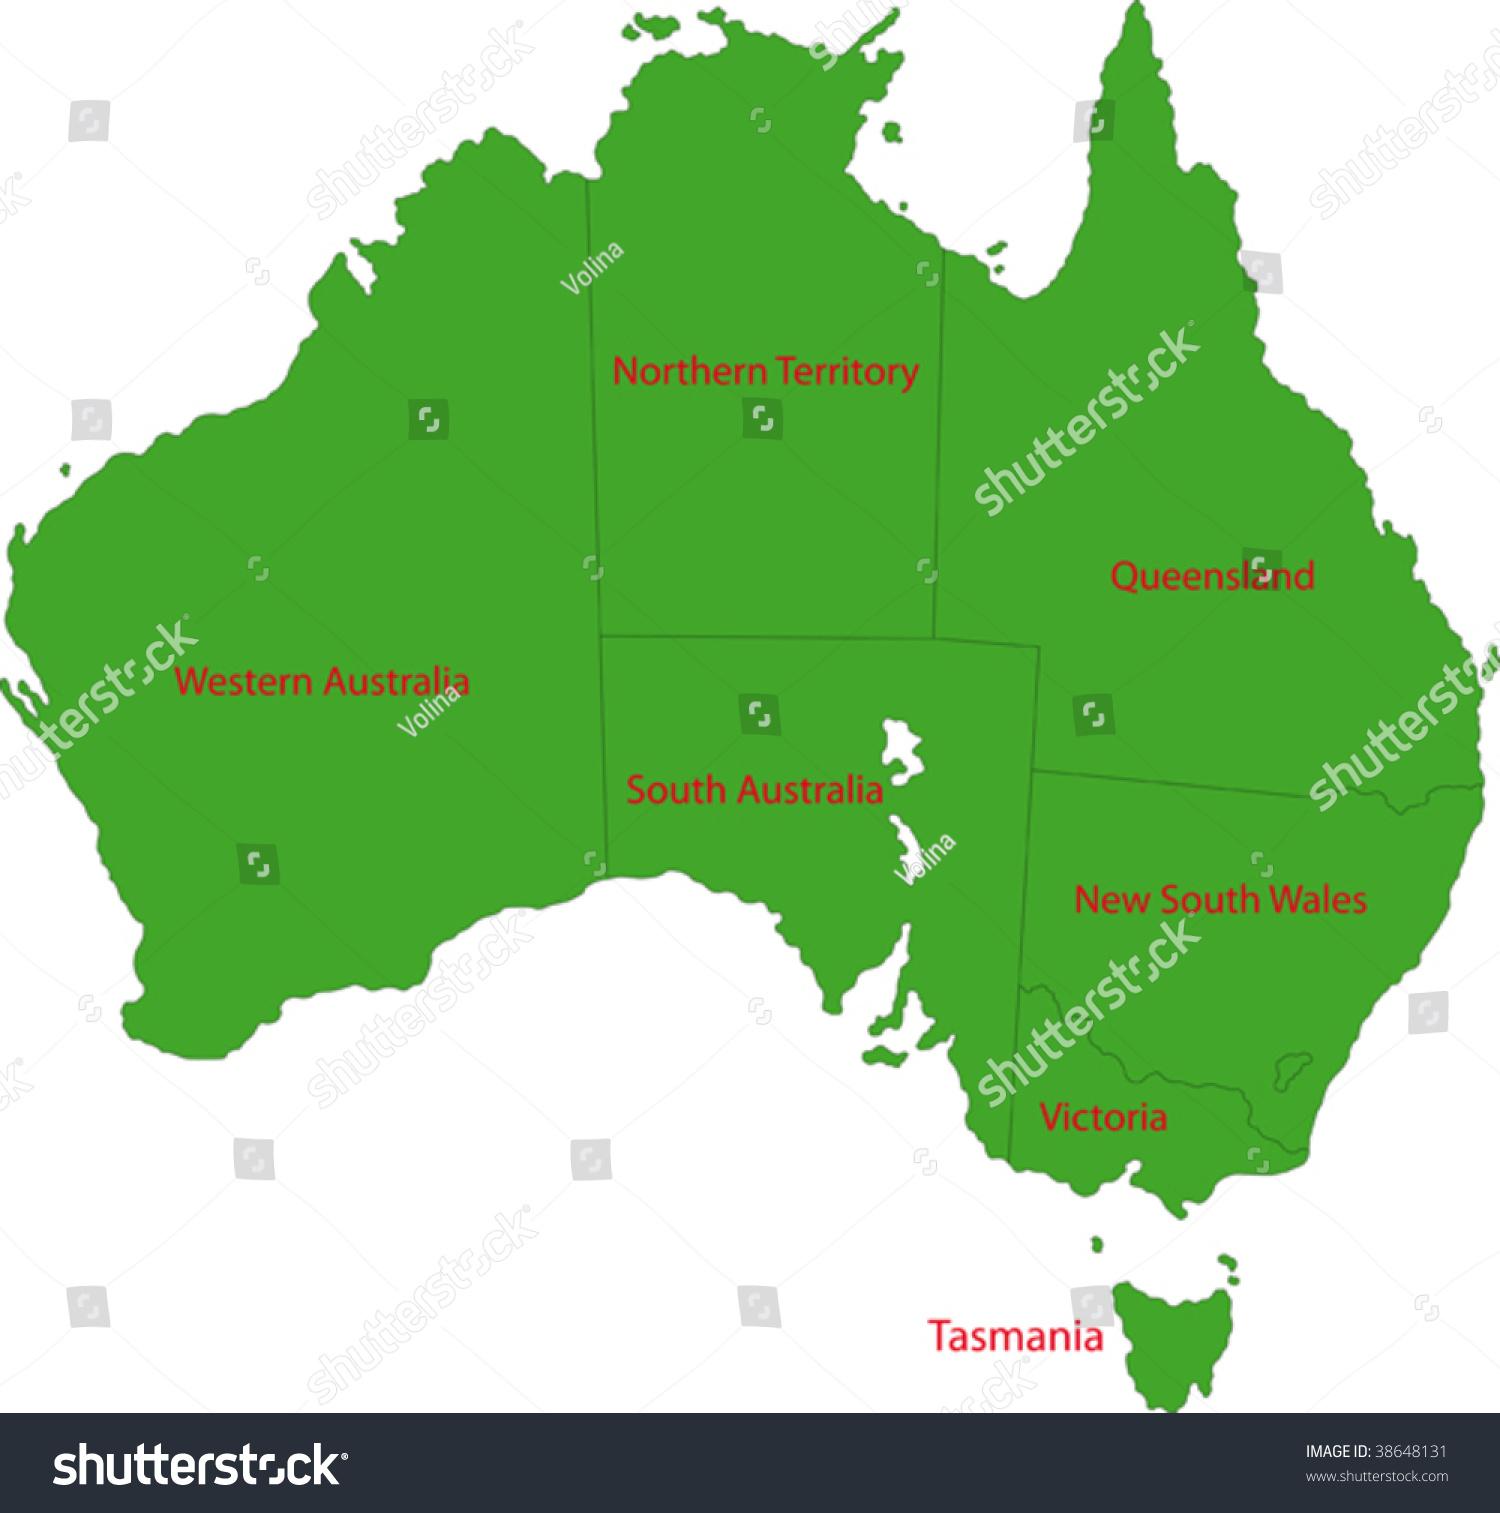 Map Administrative Divisions Australia Stock Vector 38648131